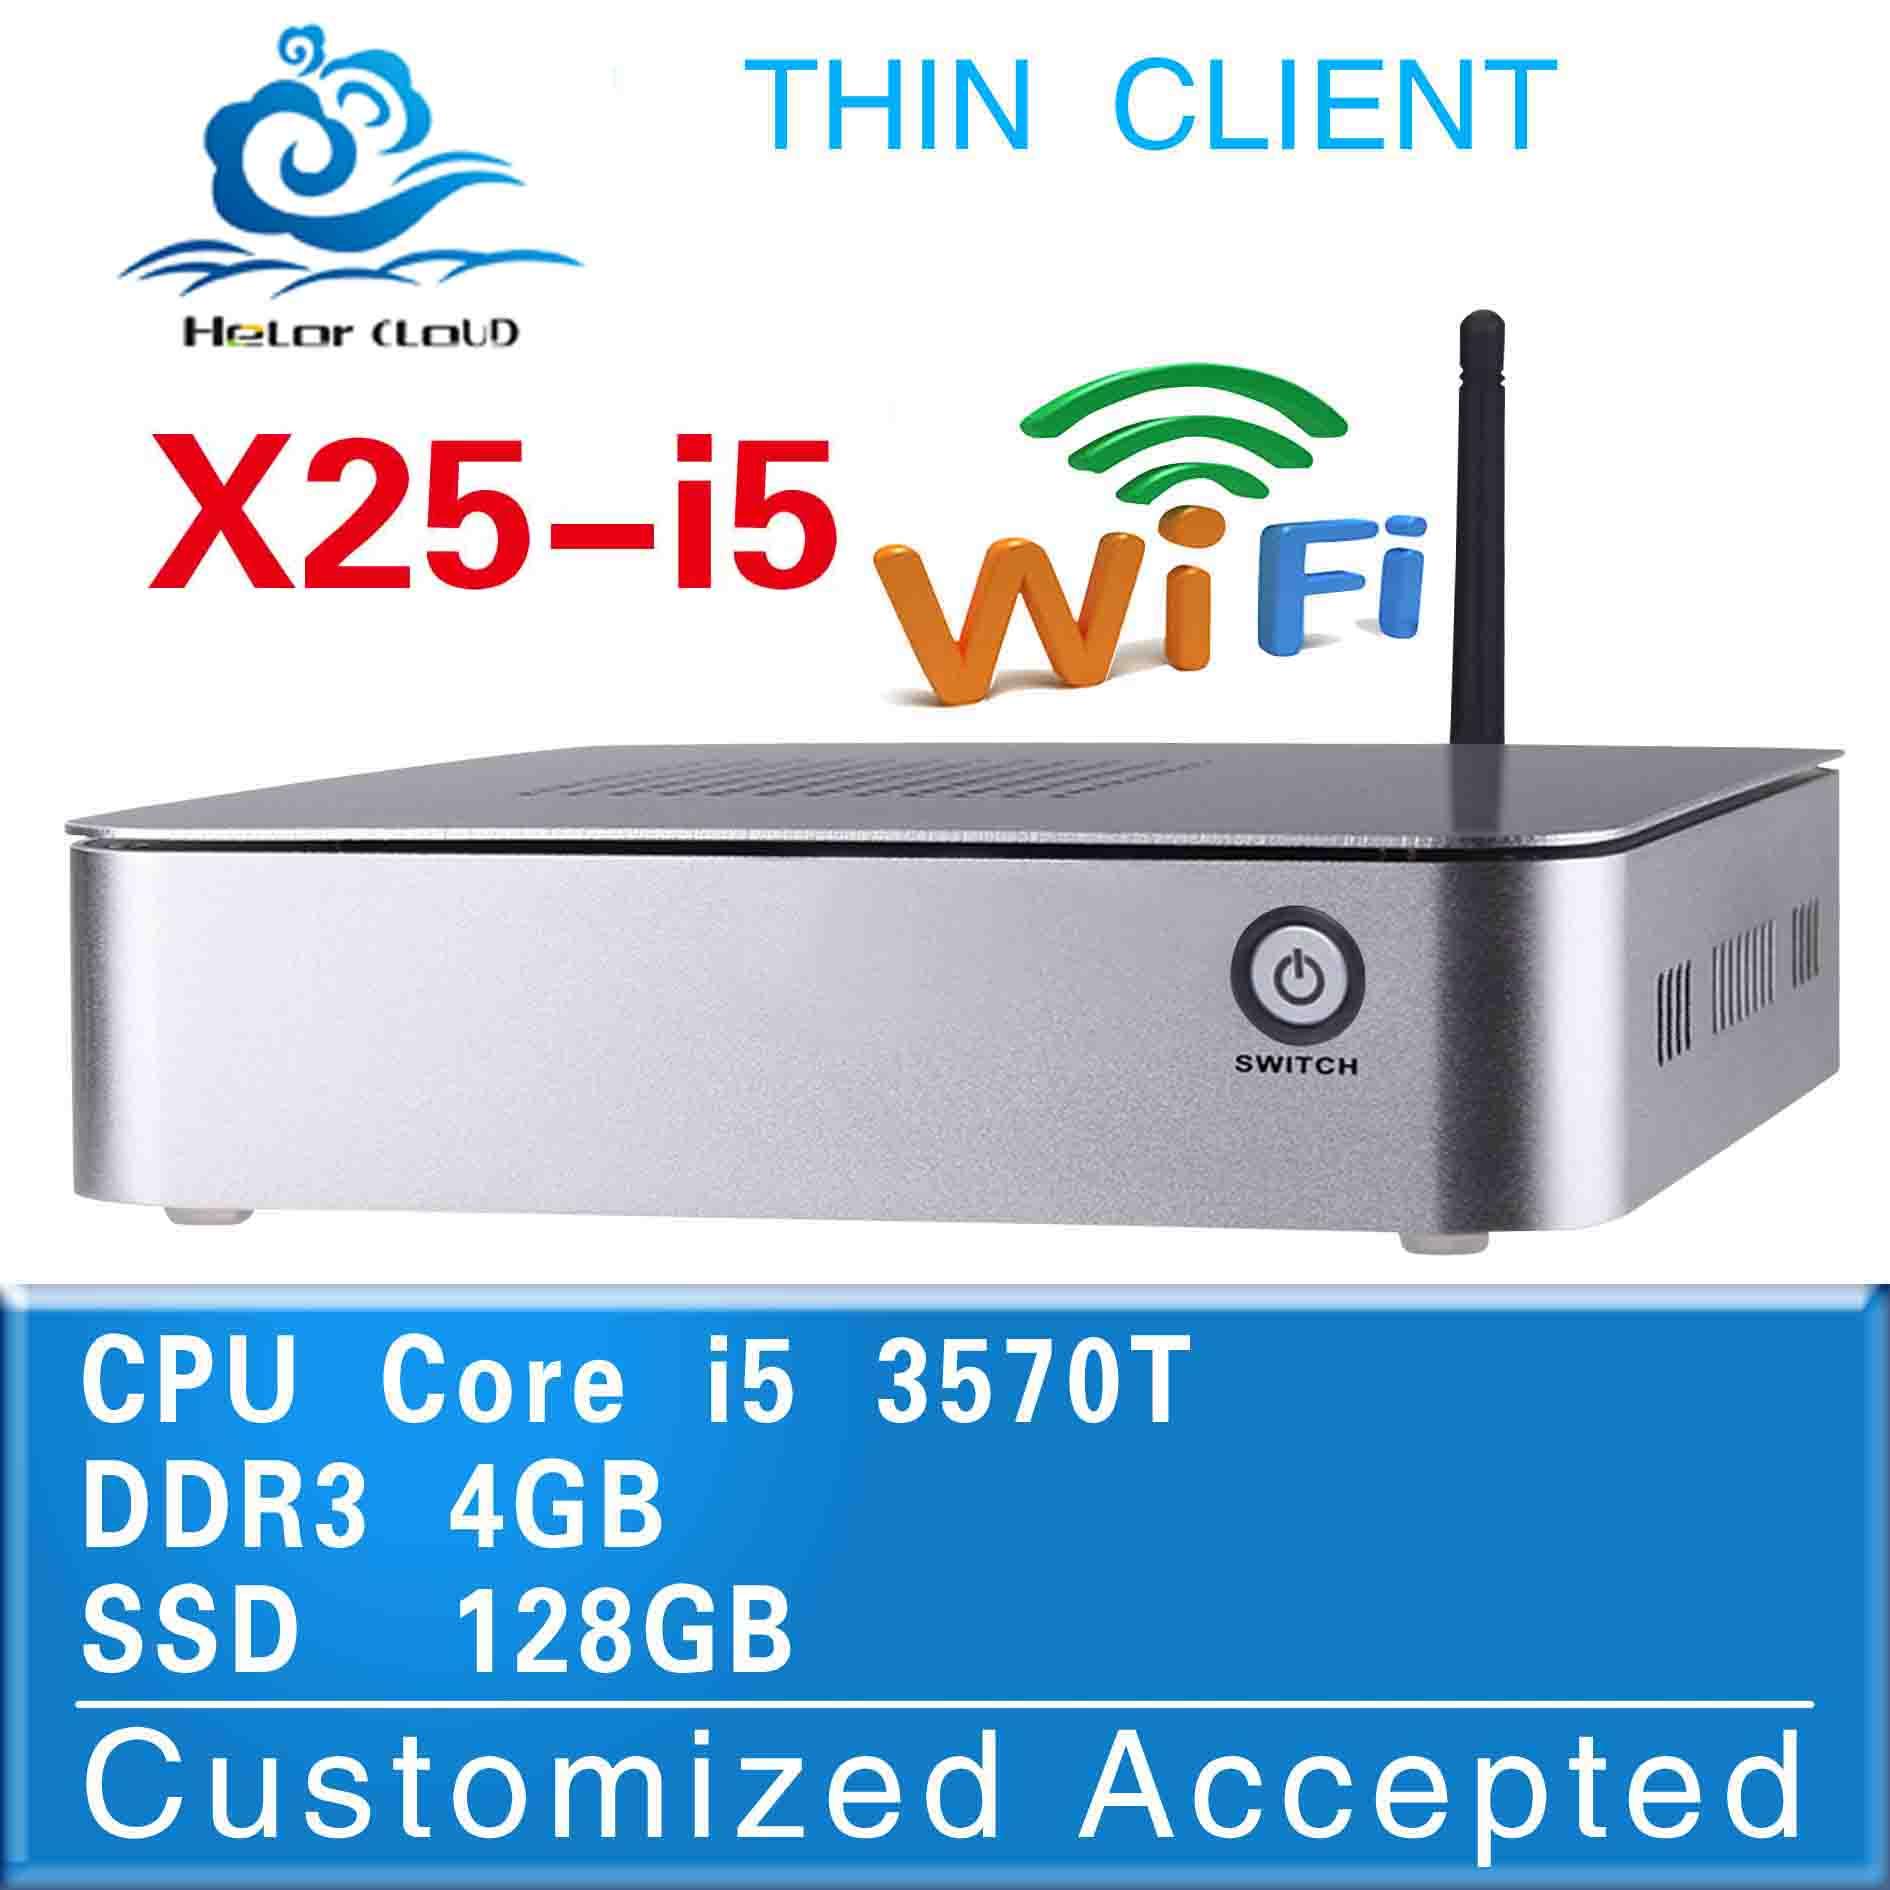 Hot on sale x25-i5 intel i5 2390T desktop computer case mini pc 4gb ram 128gb ssd thin client support full screen movies(China (Mainland))